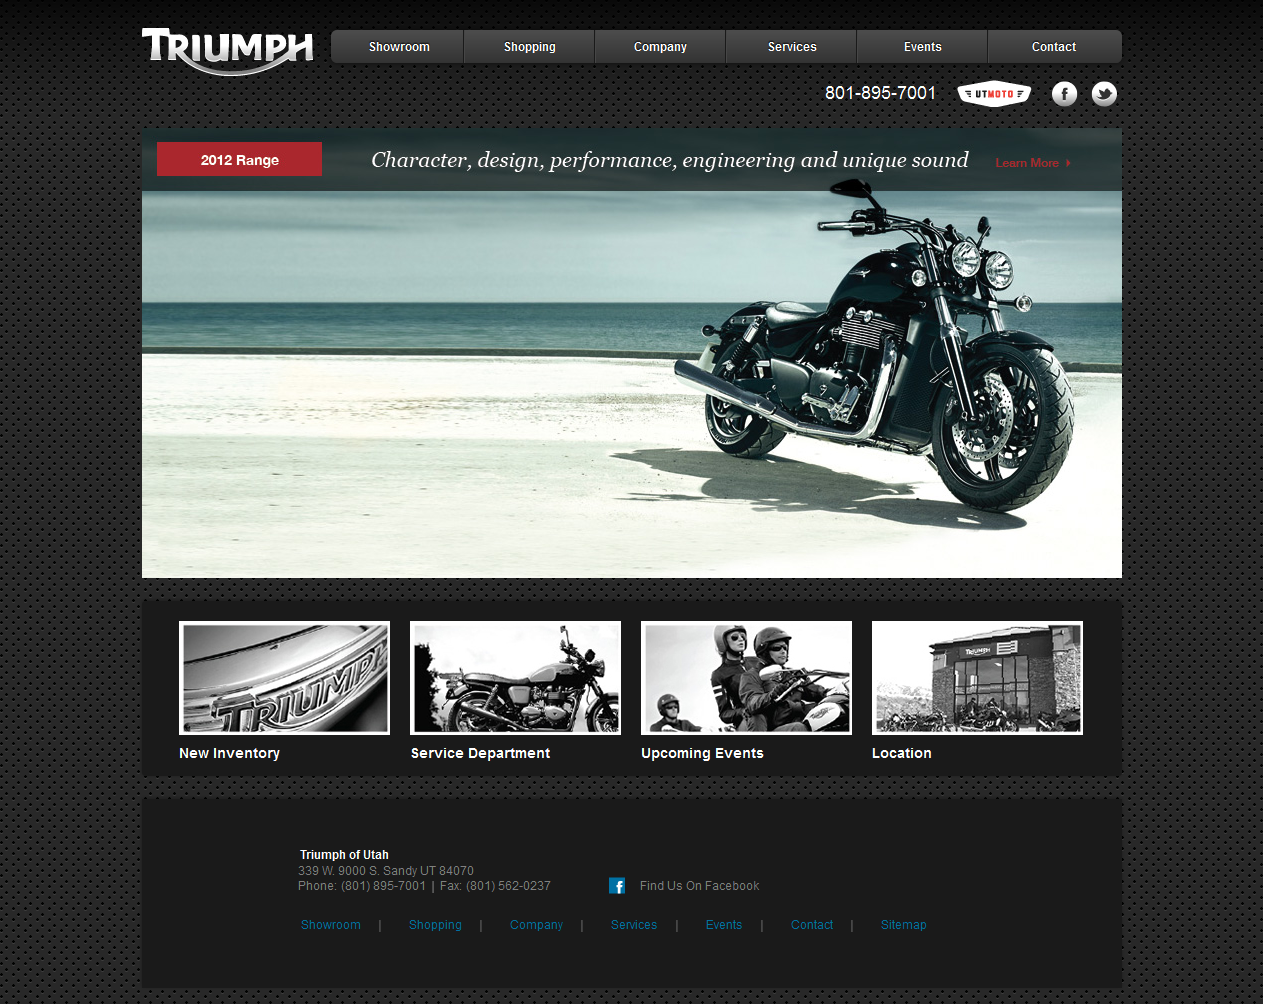 www.triumphofutah.com